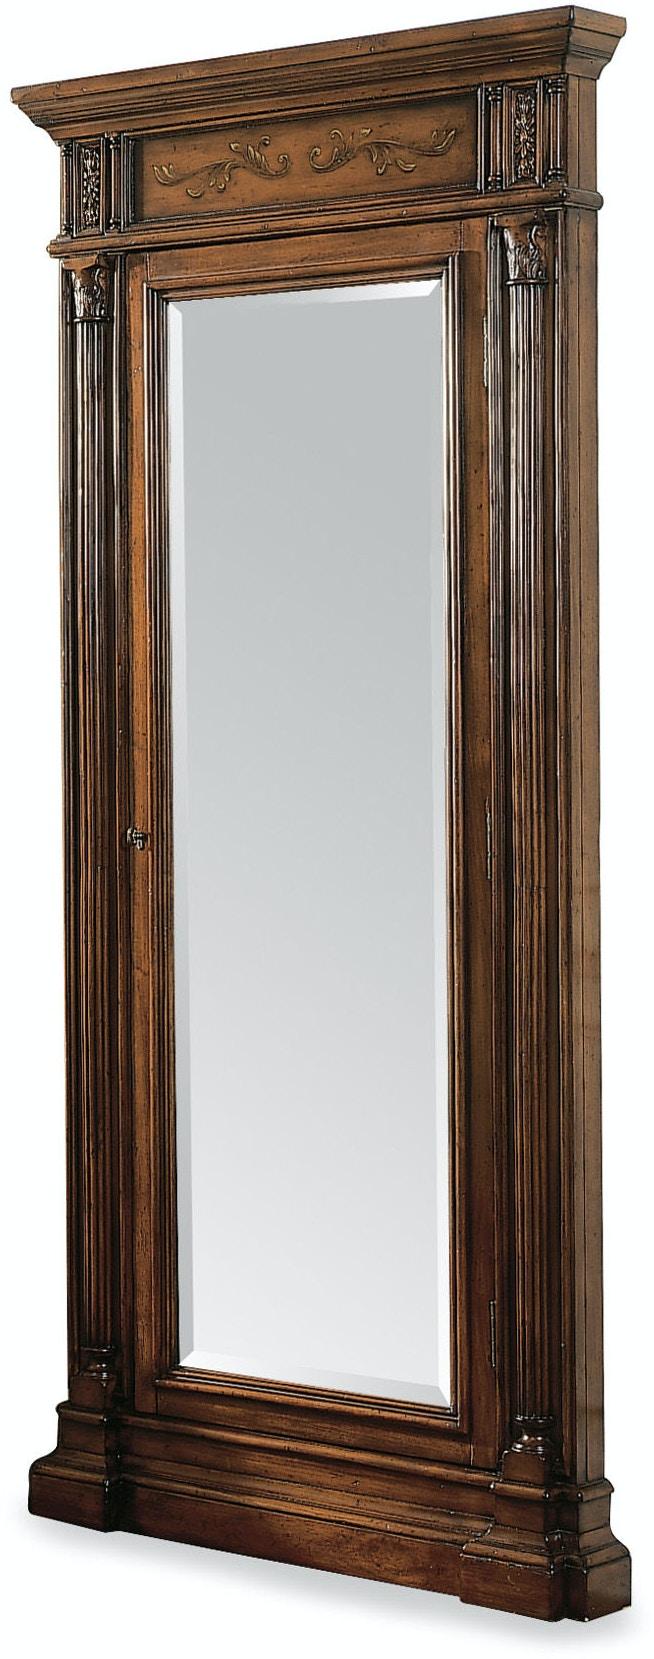 Hooker Furniture Accessories Floor Mirror W Jewelry